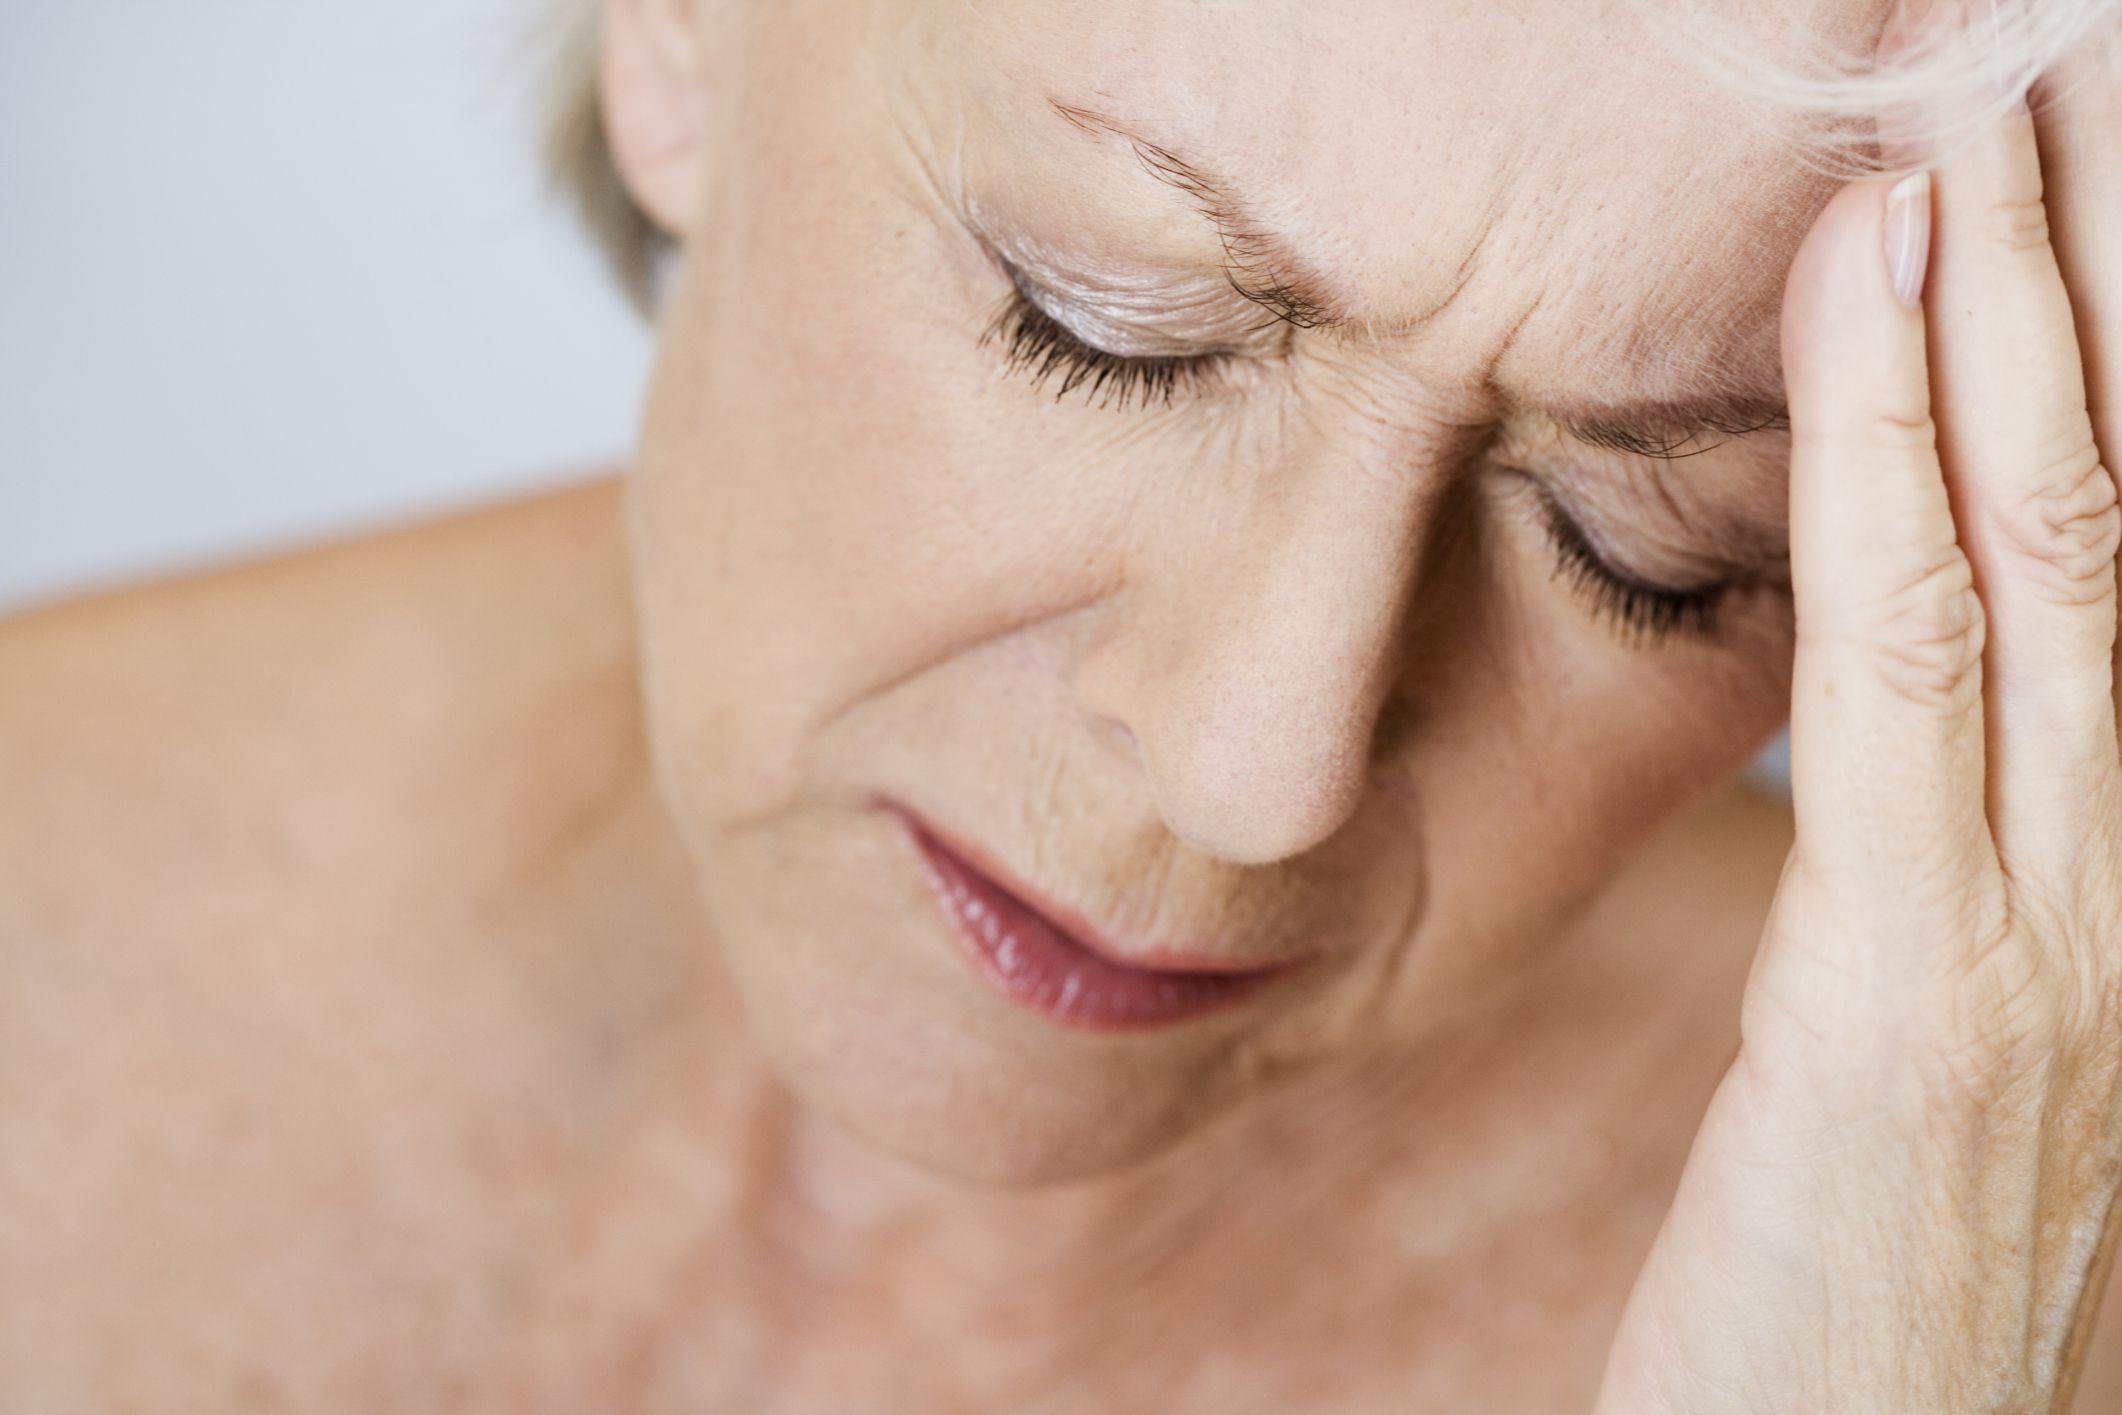 The Effects of a Frontal Lobe Stroke